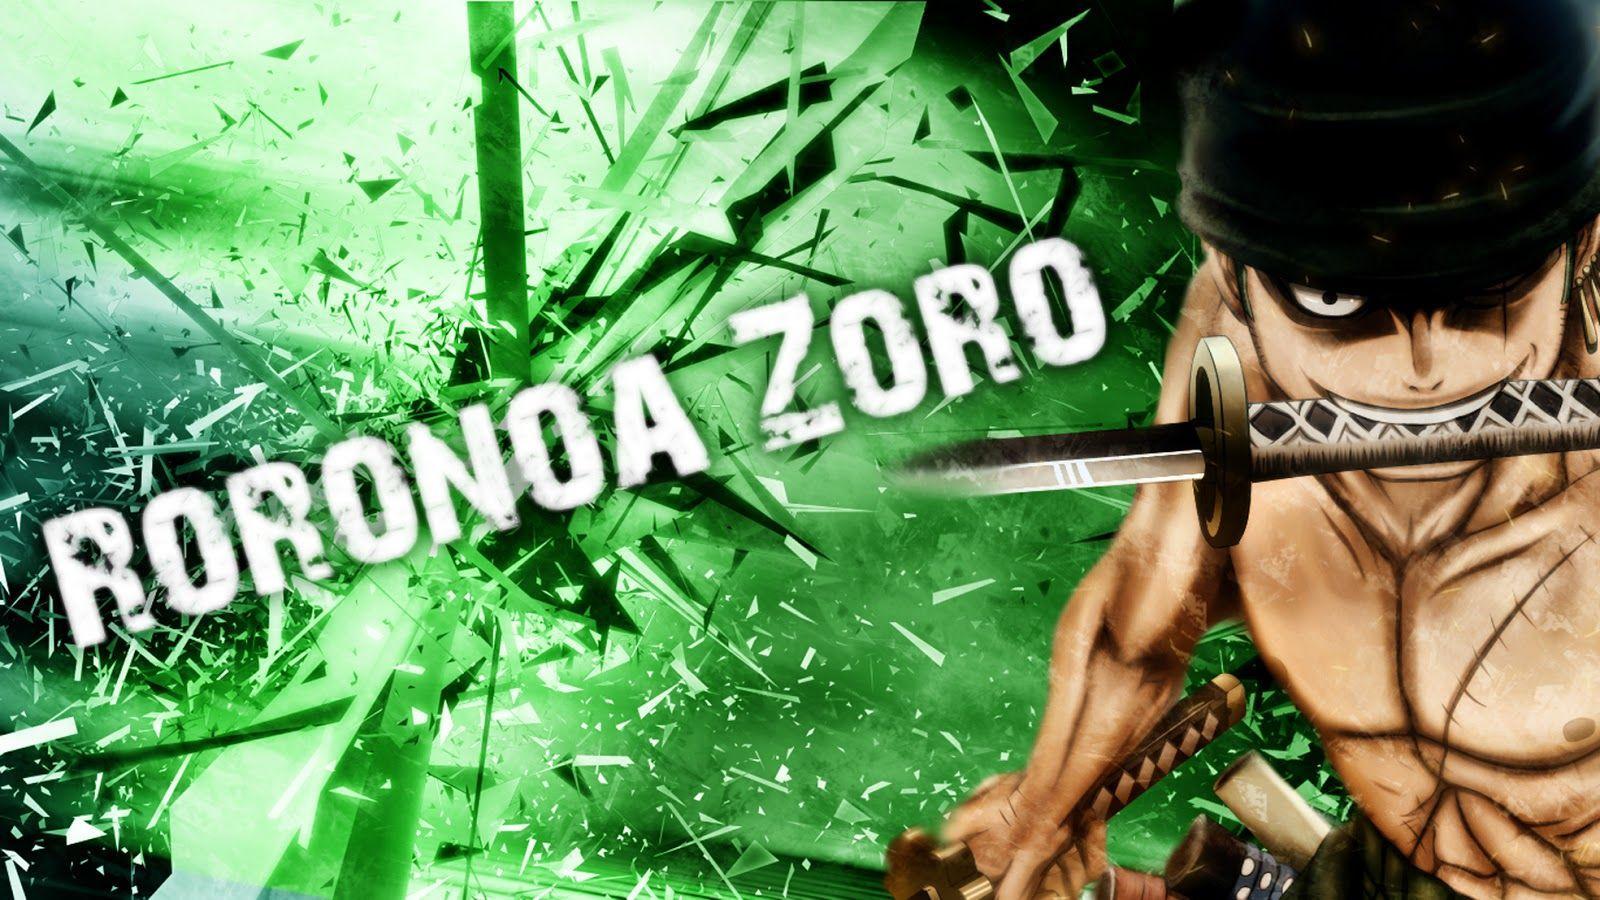 Roronoa Zoro Computer Wallpapers - Wallpaper Cave